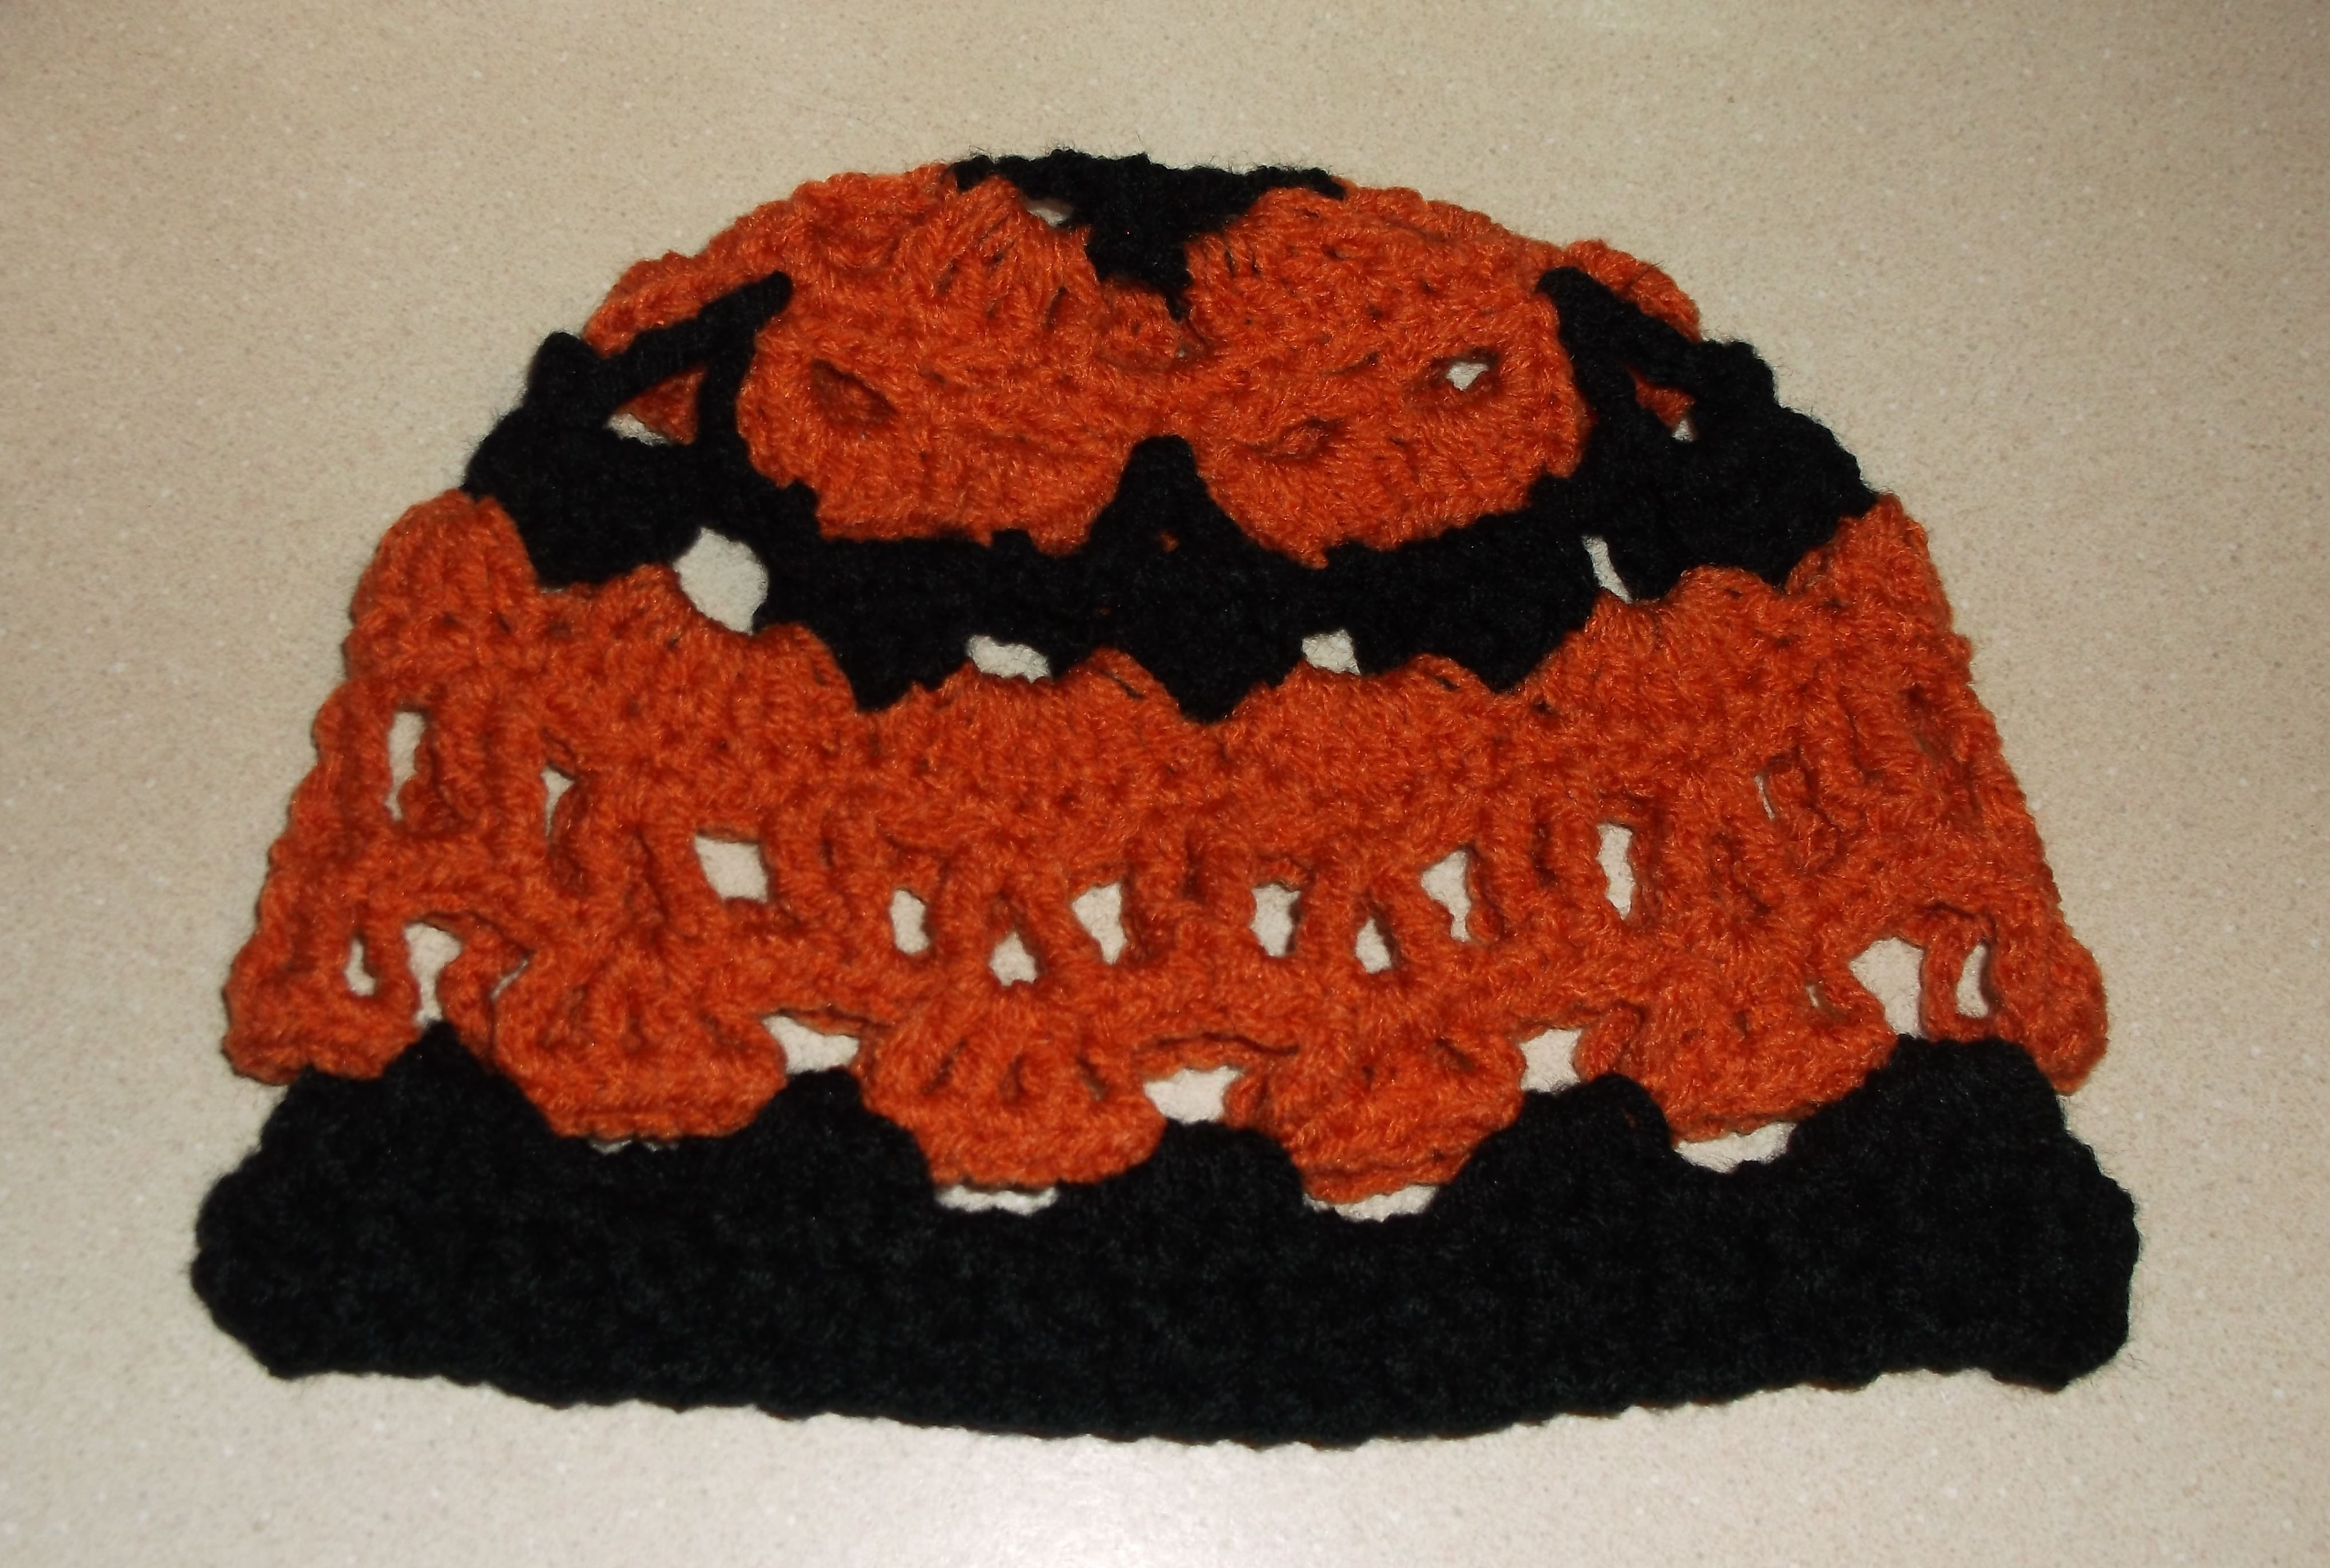 Creepy Skulls Crochet Hat Harley Davidson Colors Black And Orange